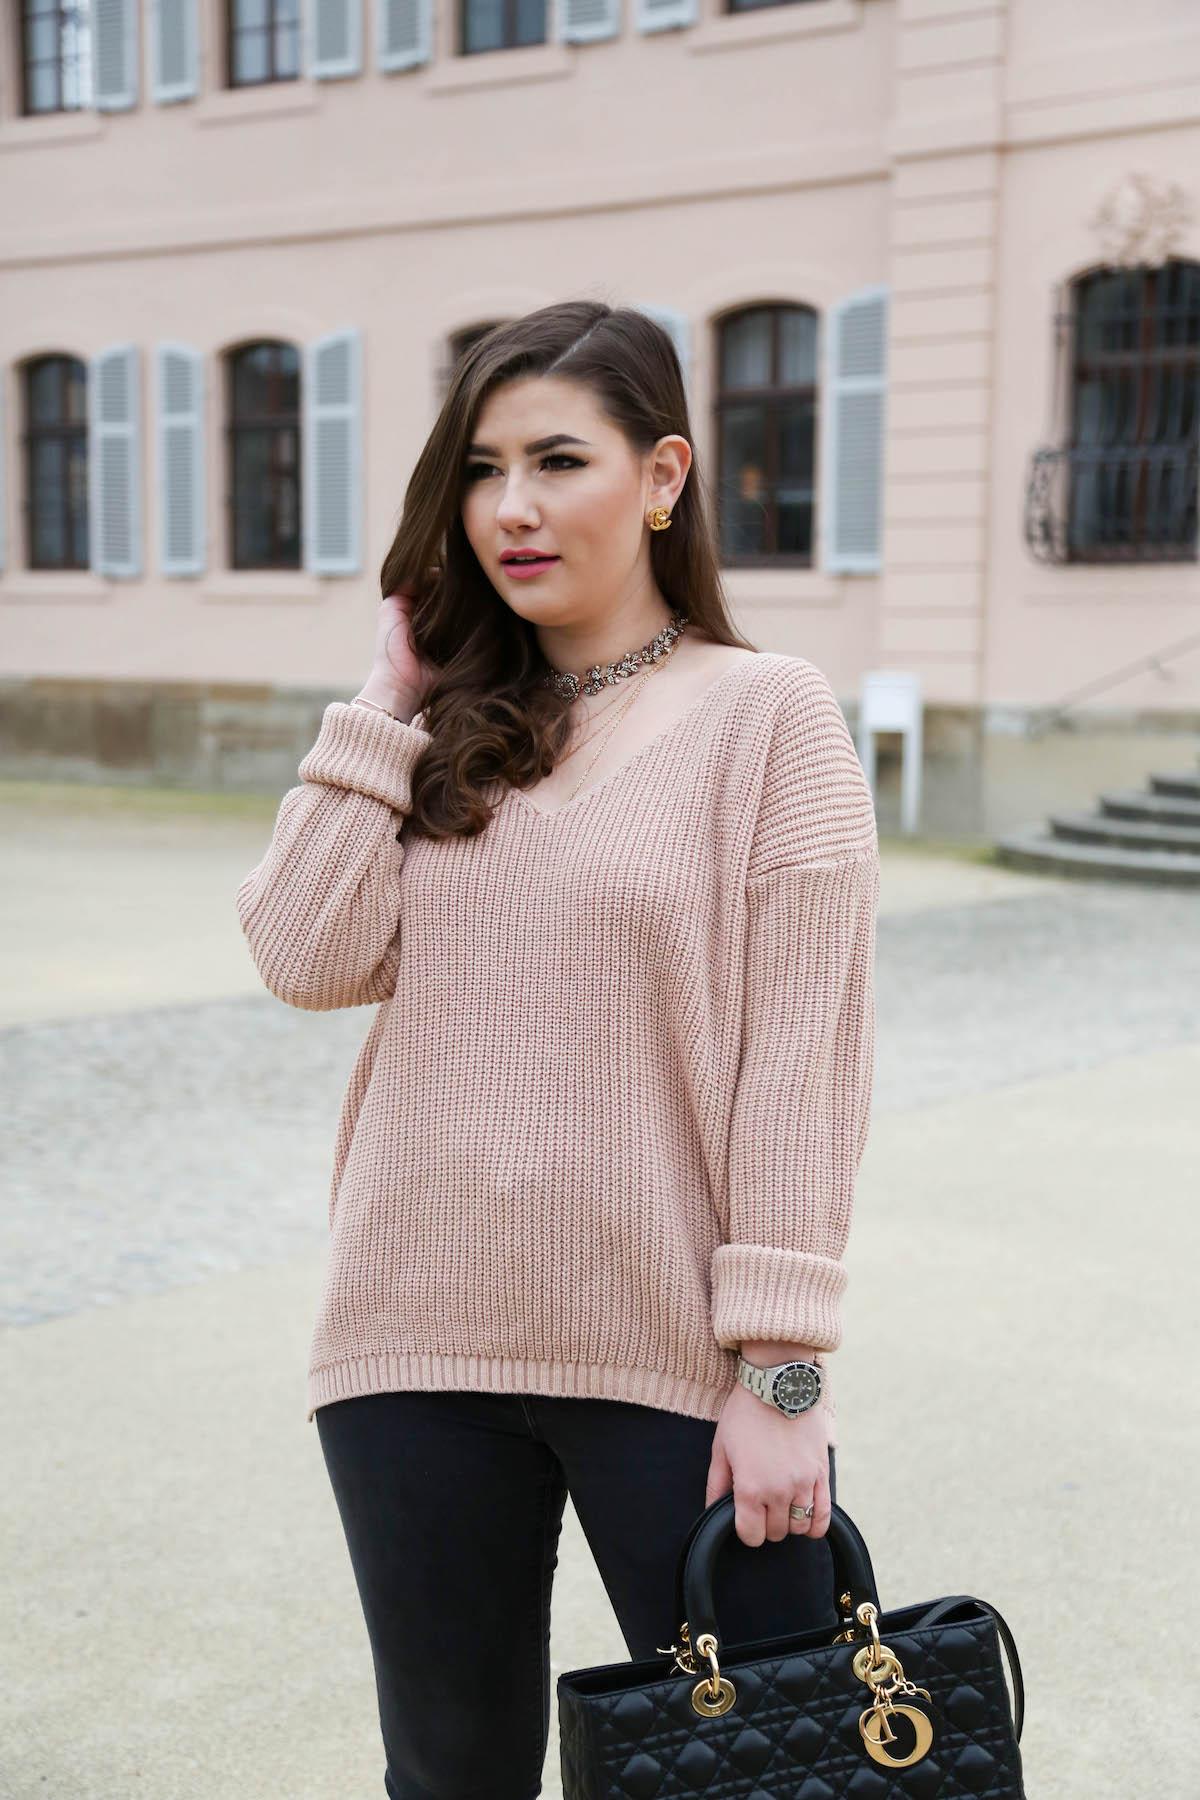 sara-bow-fashion-blogger-stuttgart-outfit-mit-ladybag-dior